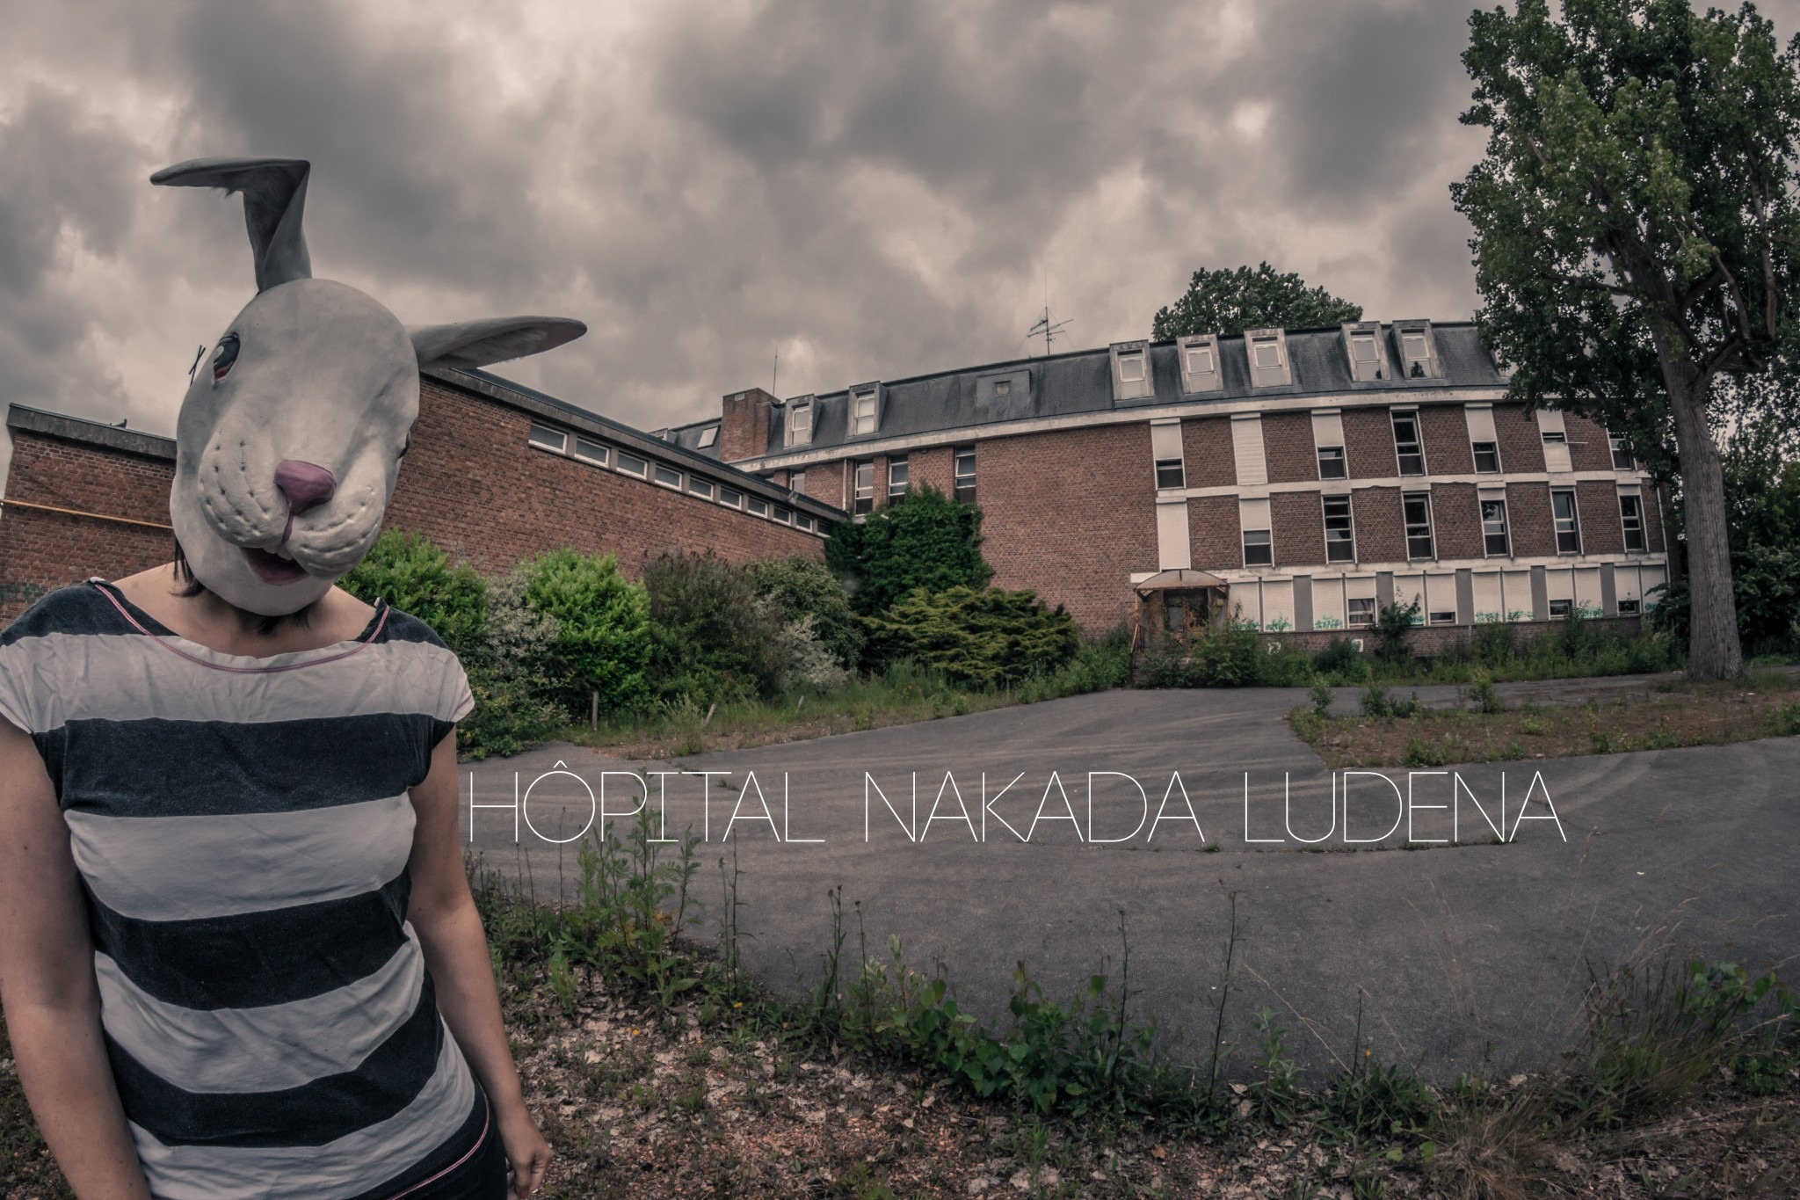 hopital-nakada-ludena-0